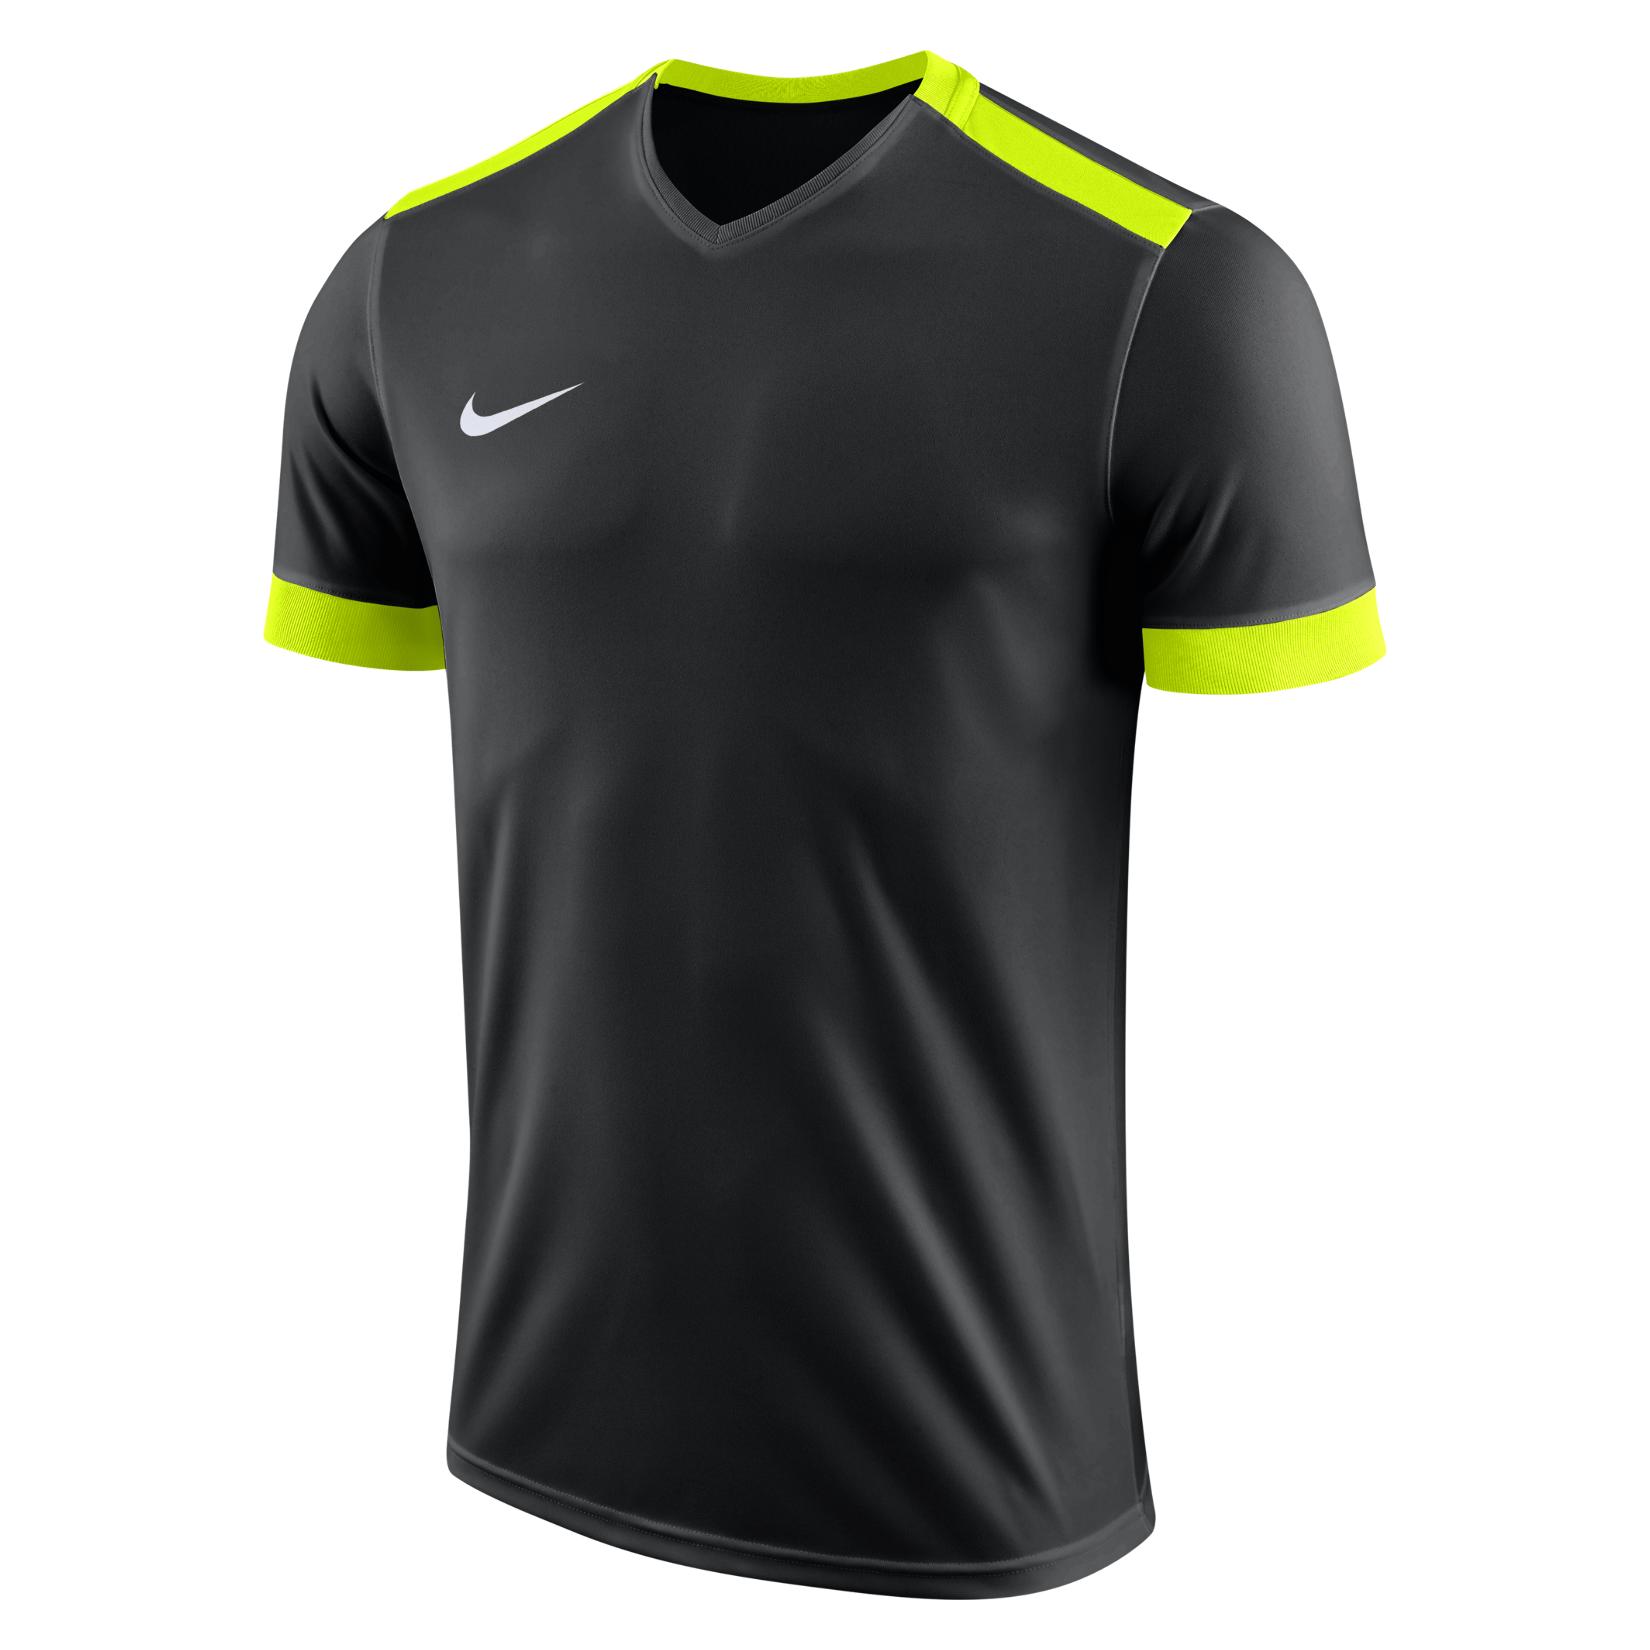 289b9f04d64bea MN Sport - Koszulka Nike PARK DERBY II 894312 010 - Sklep piłkarski ...